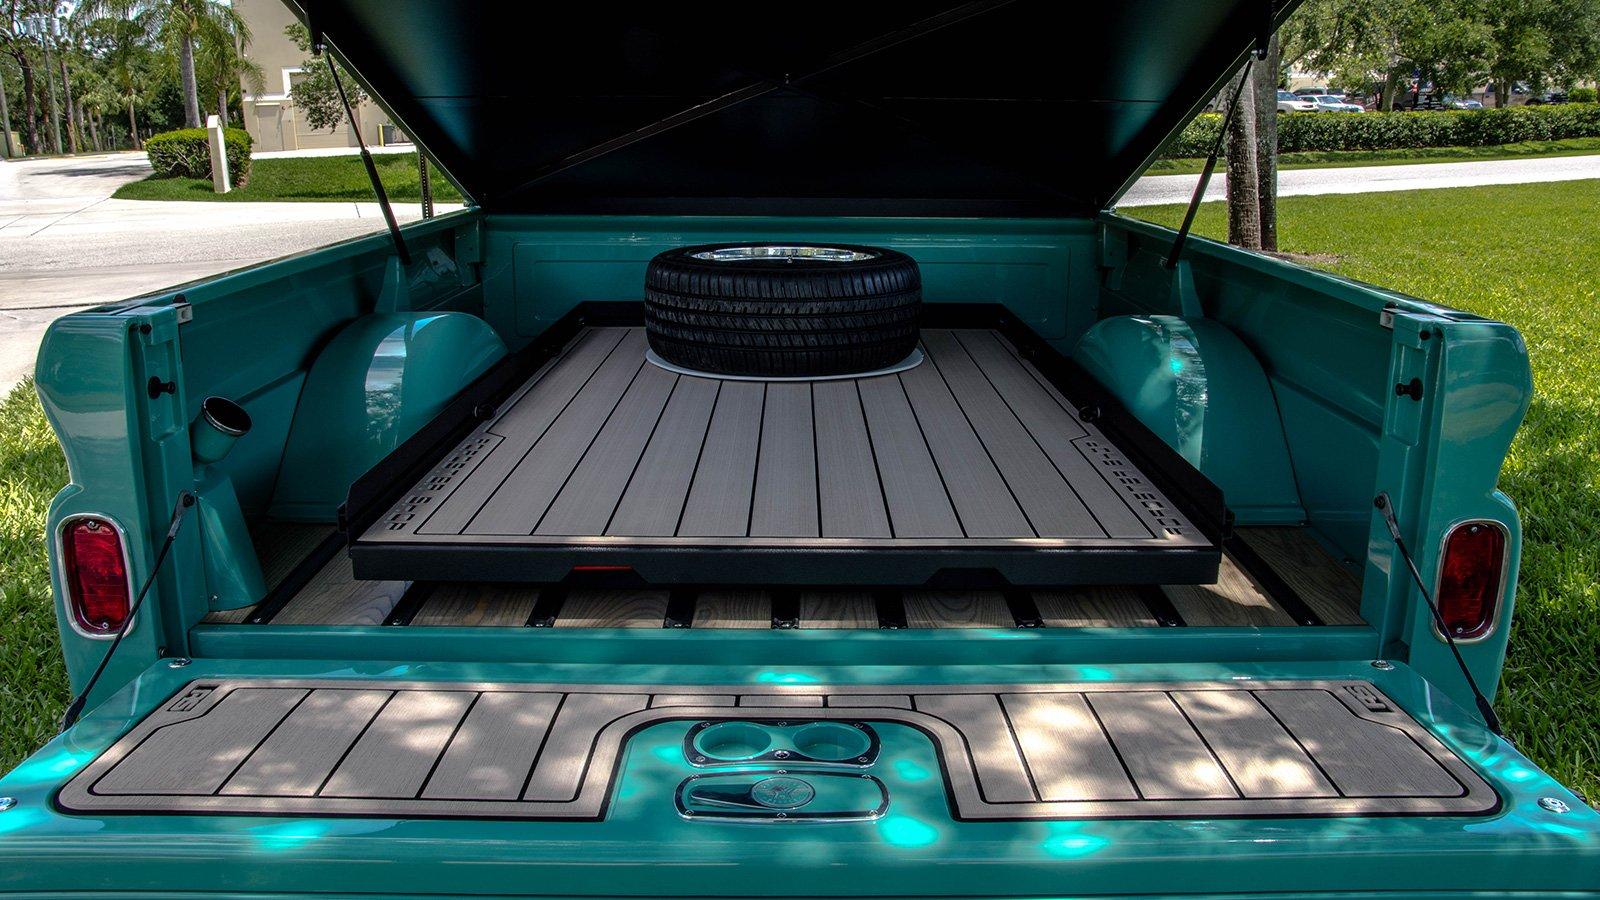 65-C10-truck-custom-bed